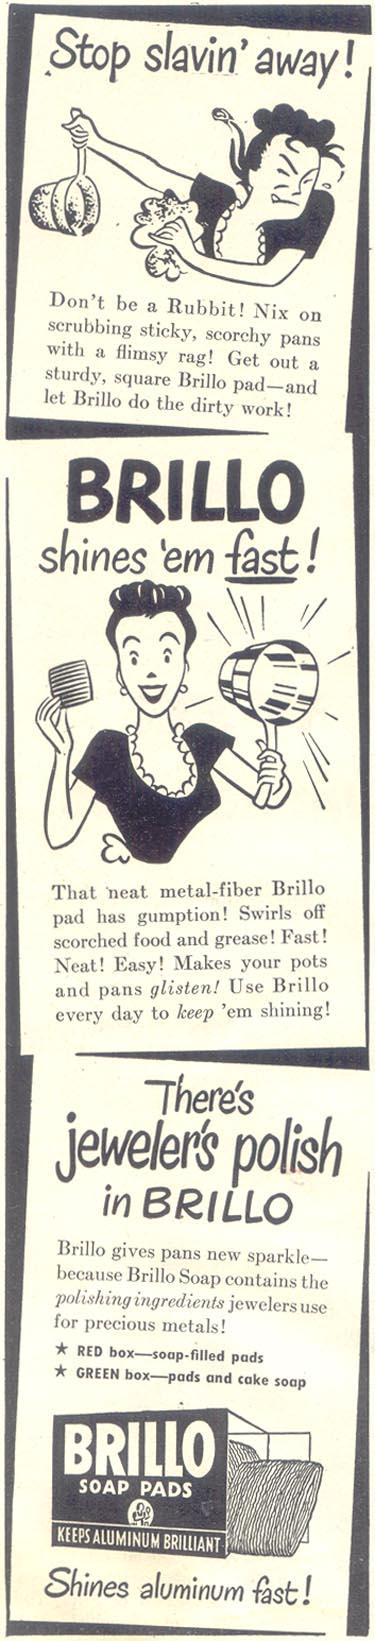 BRILLO SOAP PADS GOOD HOUSEKEEPING 07/01/1948 p. 8